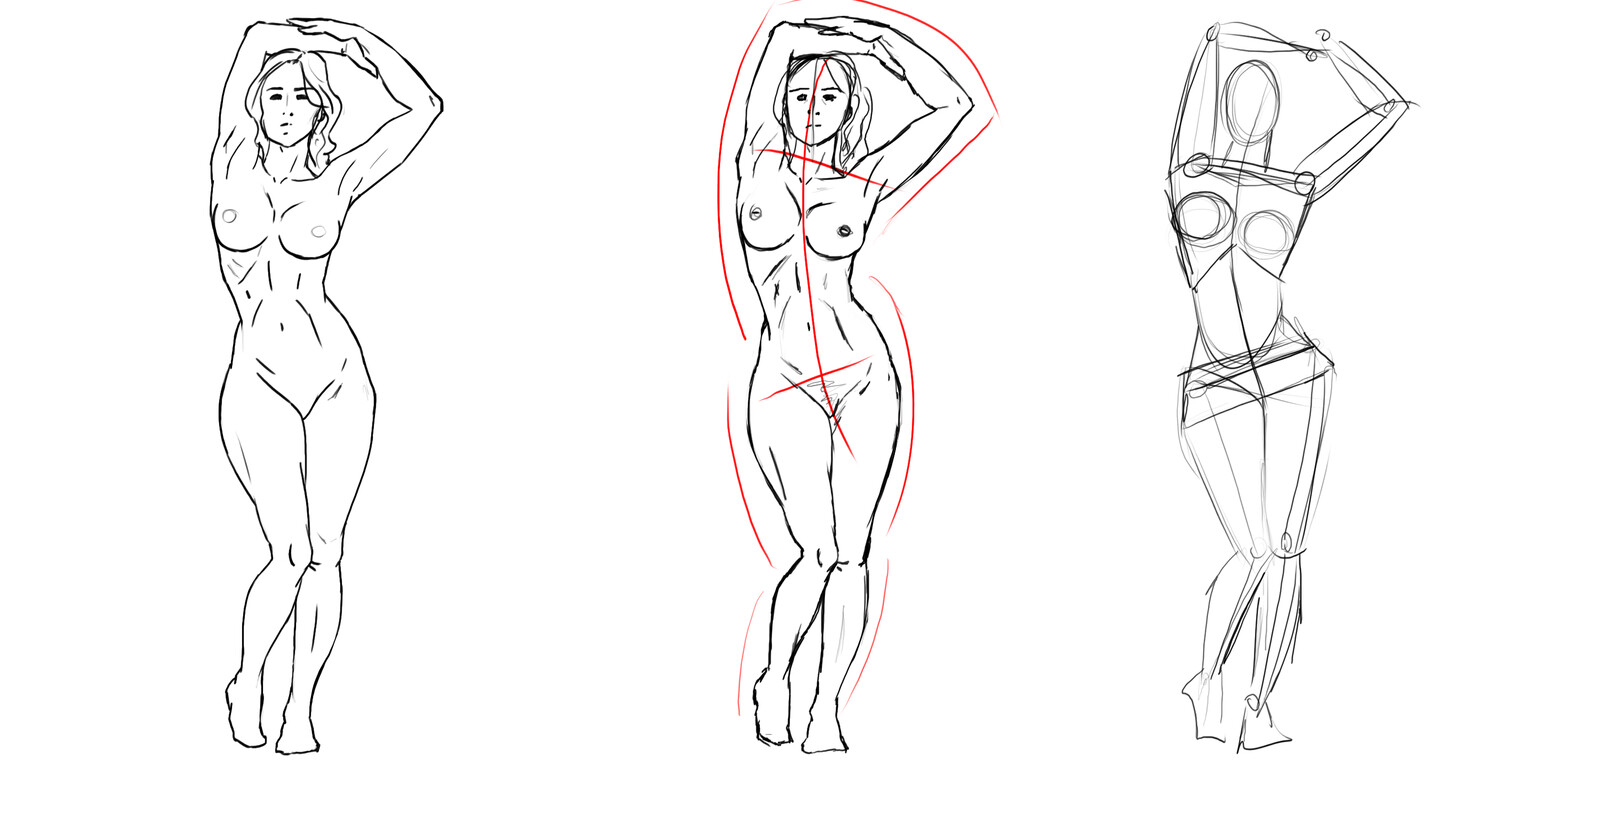 Line art Female Anatomy